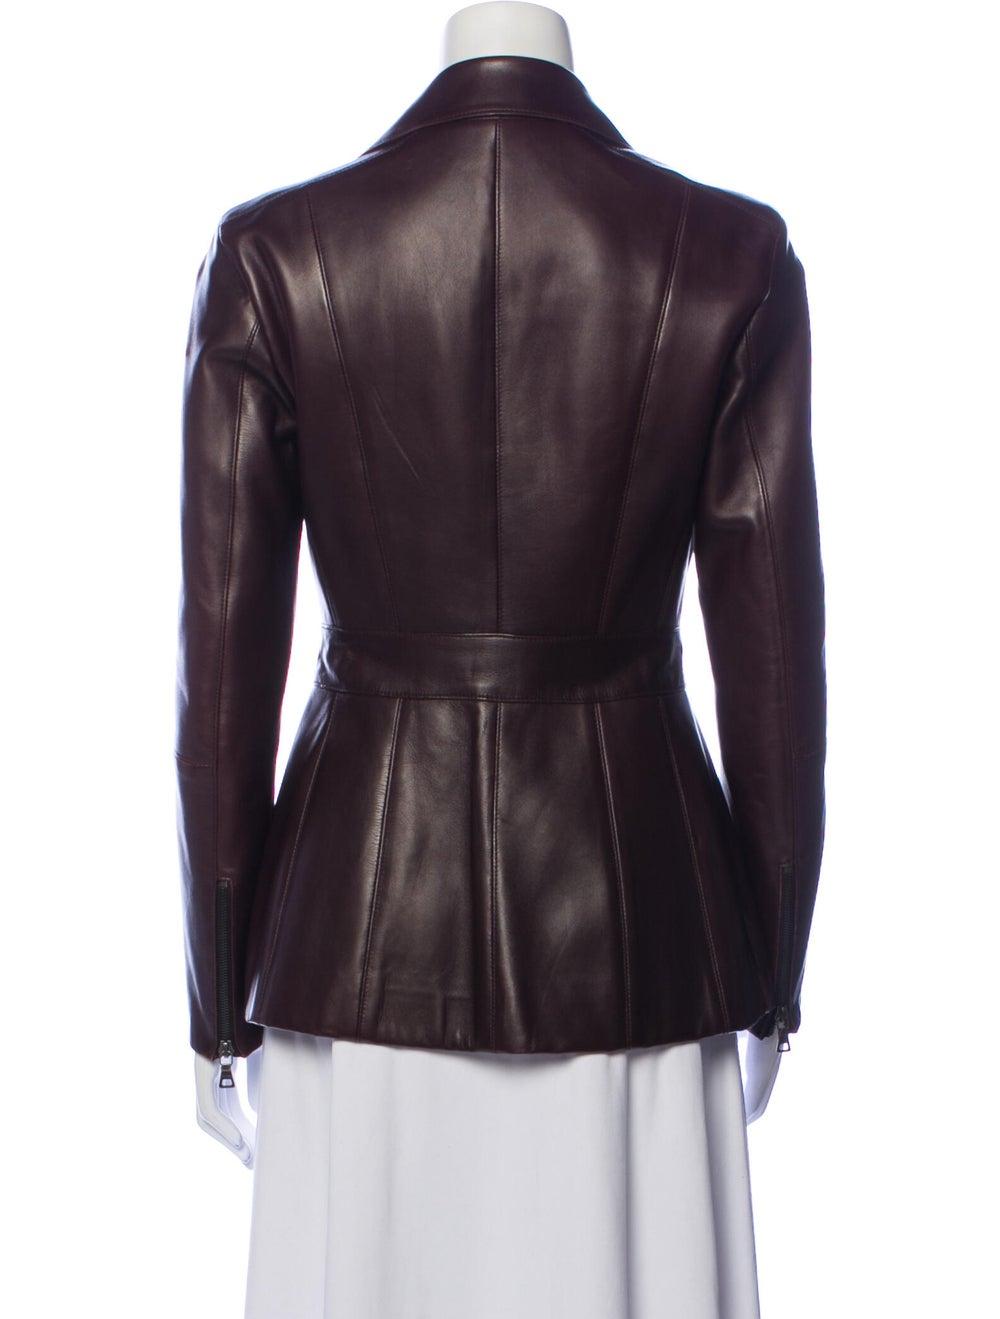 Prada Leather Biker Jacket Brown - image 3